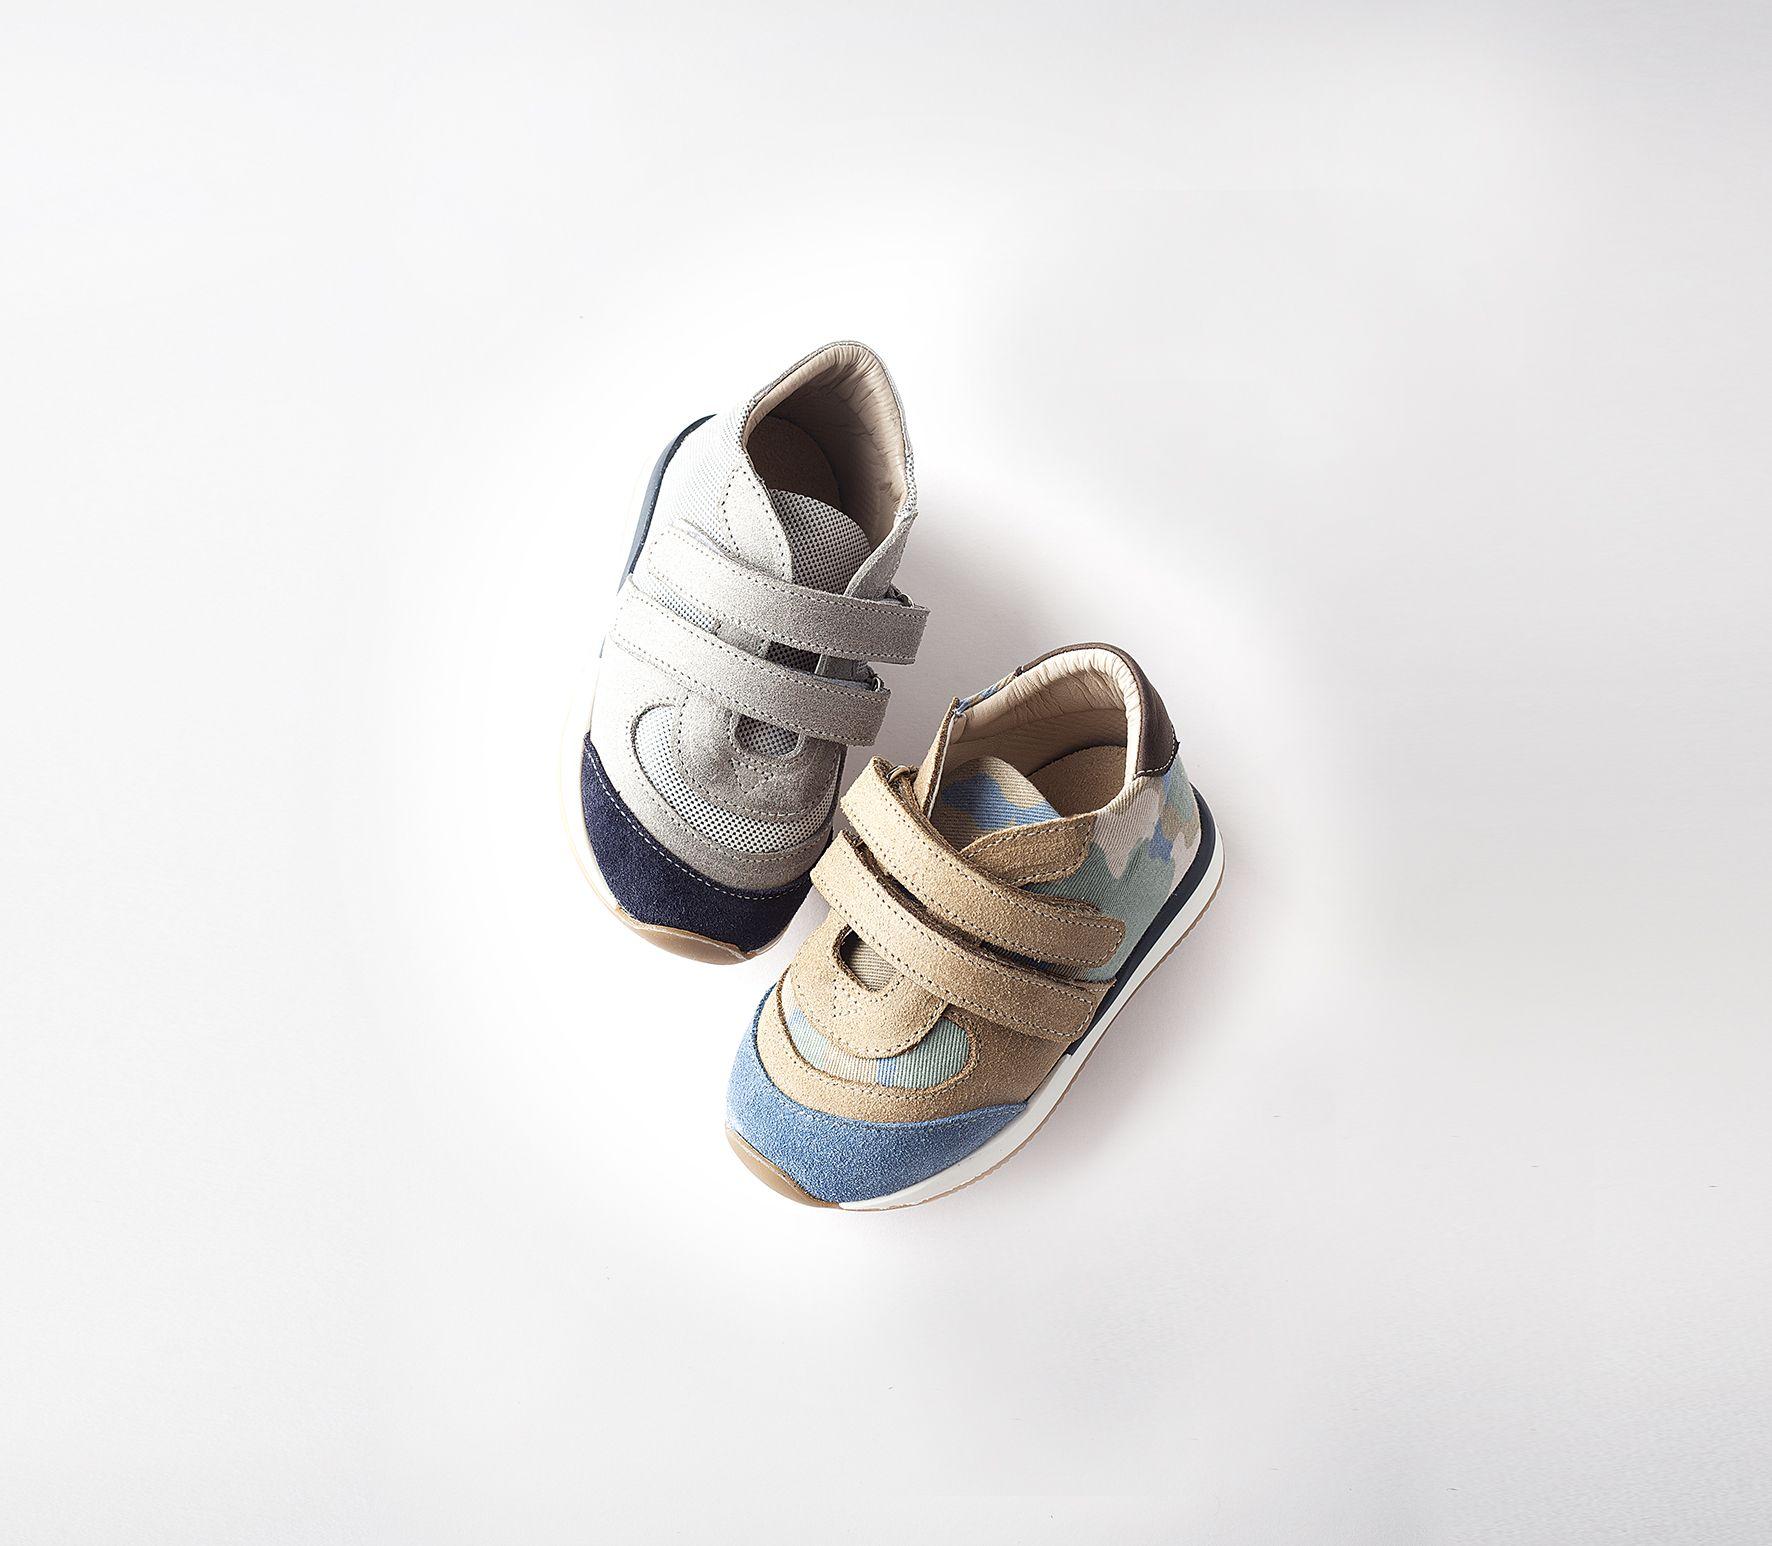 Handcrafted velcro SNEAKER S by BABYWALKER  babywalker  shoes   babywalkershoes  kidsshoes  babyshoes ee696c1b0da